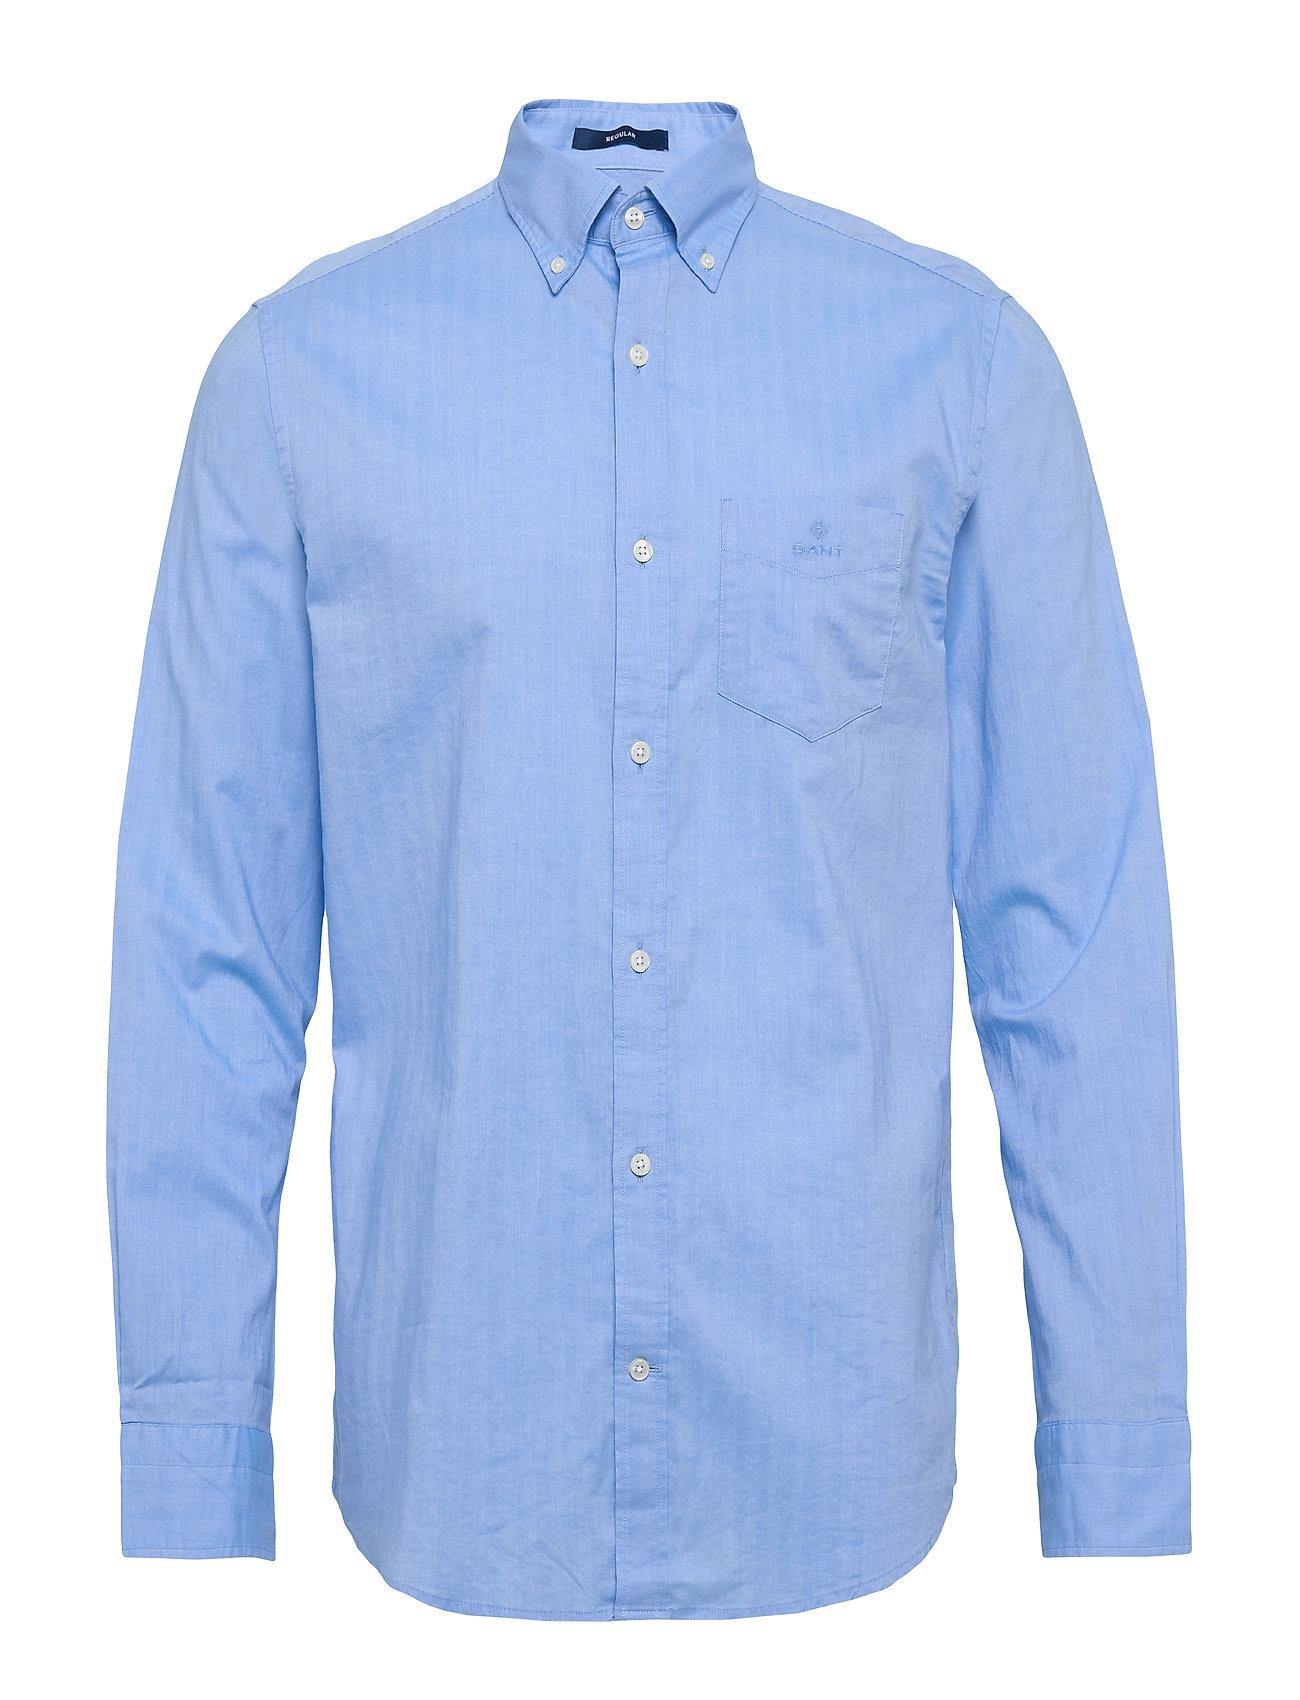 Gant D1. HERRINGBONE SOLID REG BD - PACIFIC BLUE